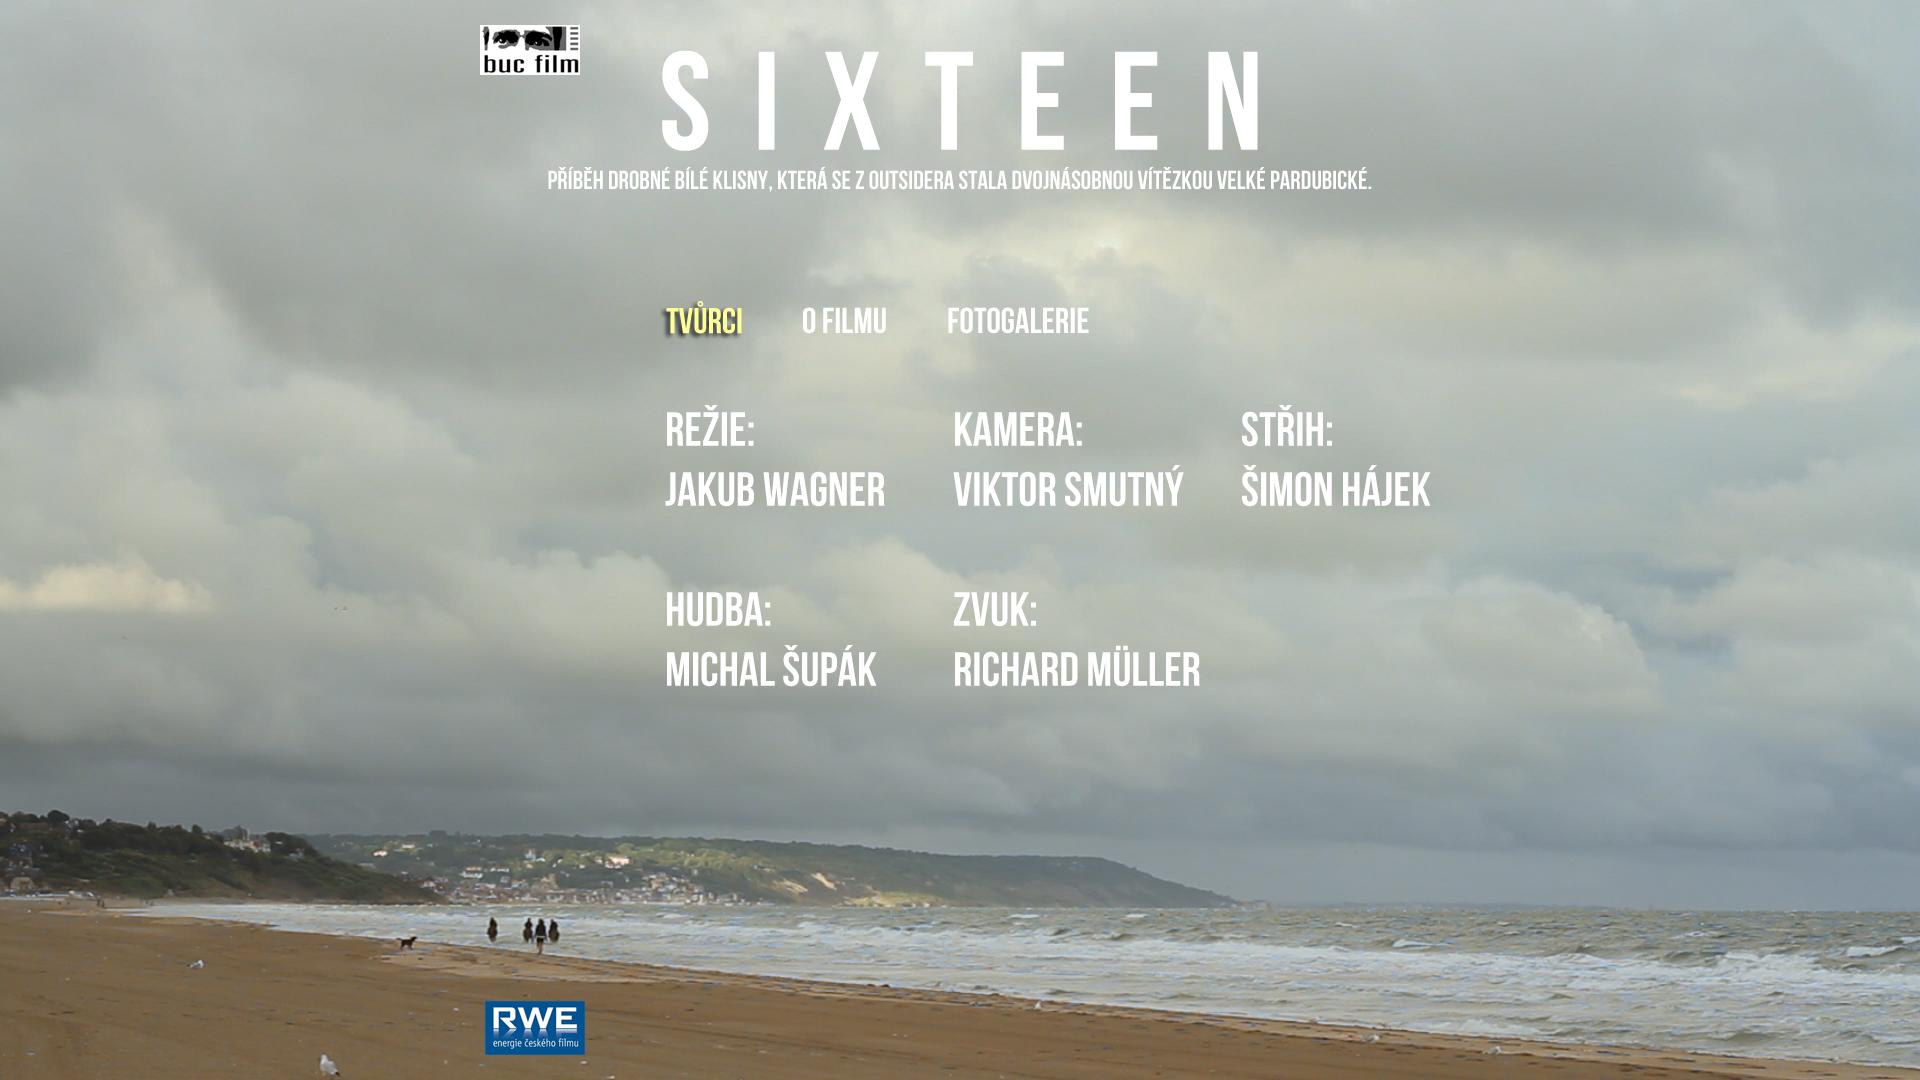 Music for TV Documentary  Sixteen  directed by Jakub Wagner and produced by Jaroslav Bouček. http://www.bucfilm.cz/sixteen/tvurci.htm